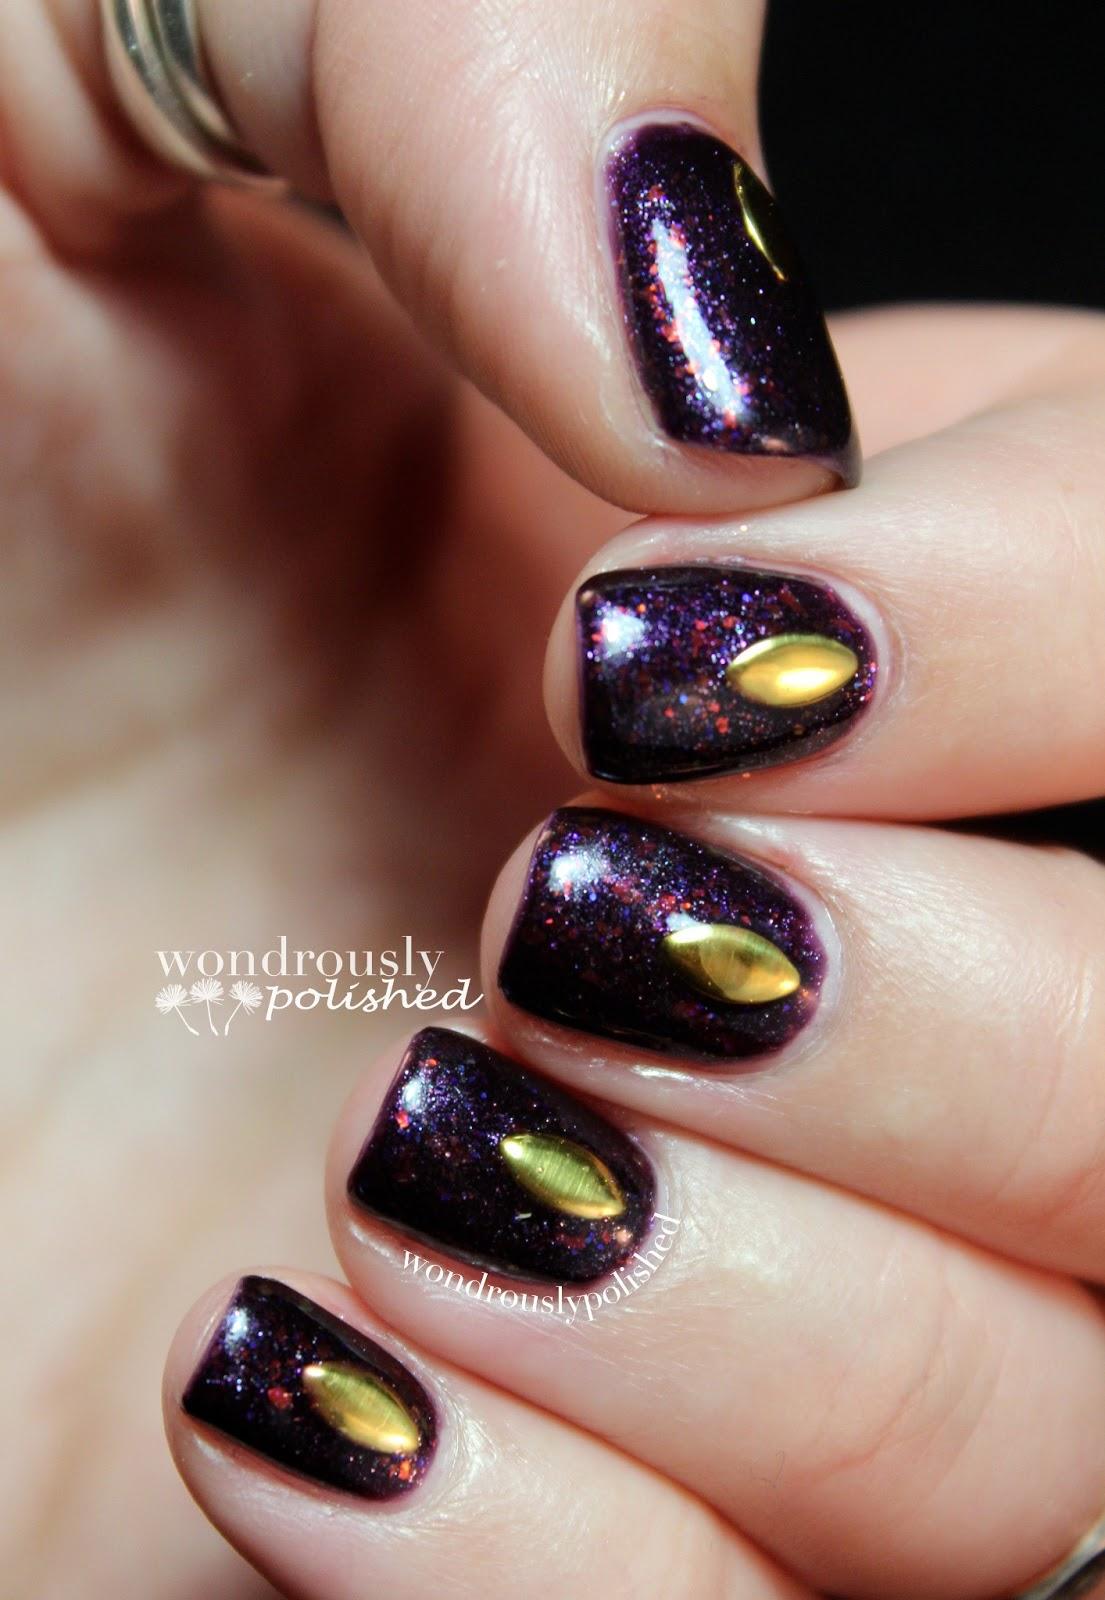 Wondrously Polished April Nail Art Challenge: Wondrously Polished: Born Pretty Store Review